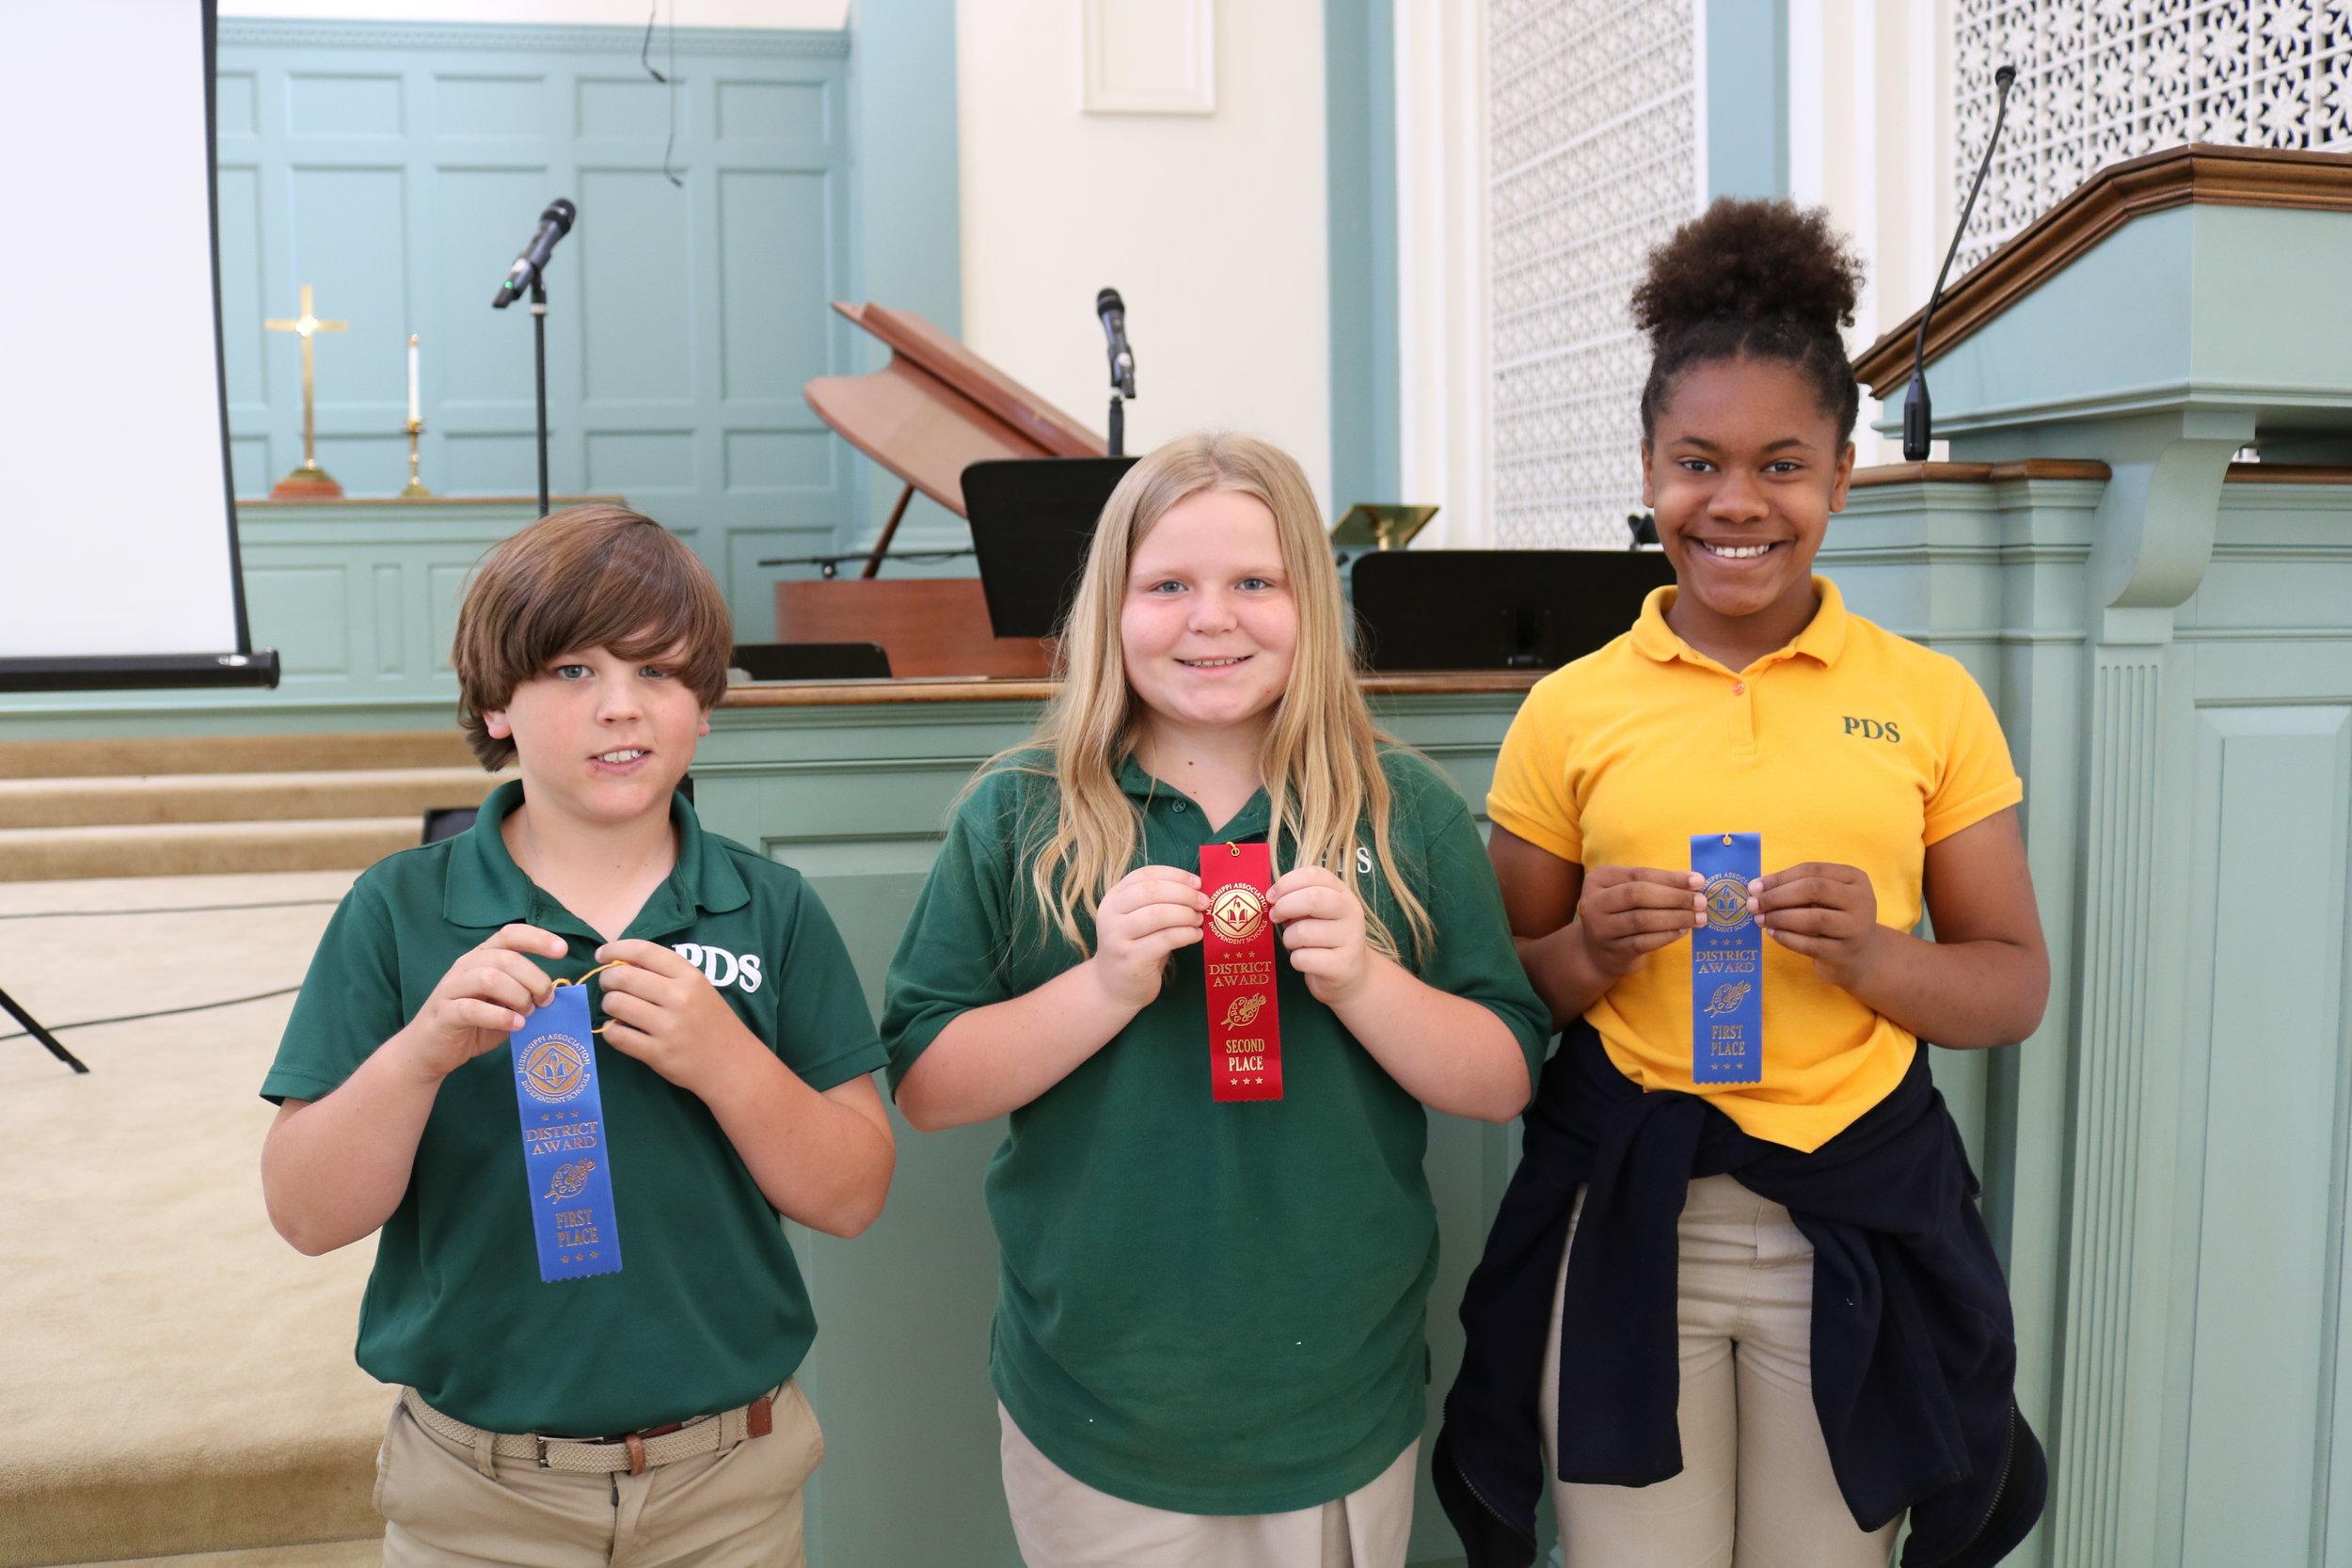 5th grade MAIS winners